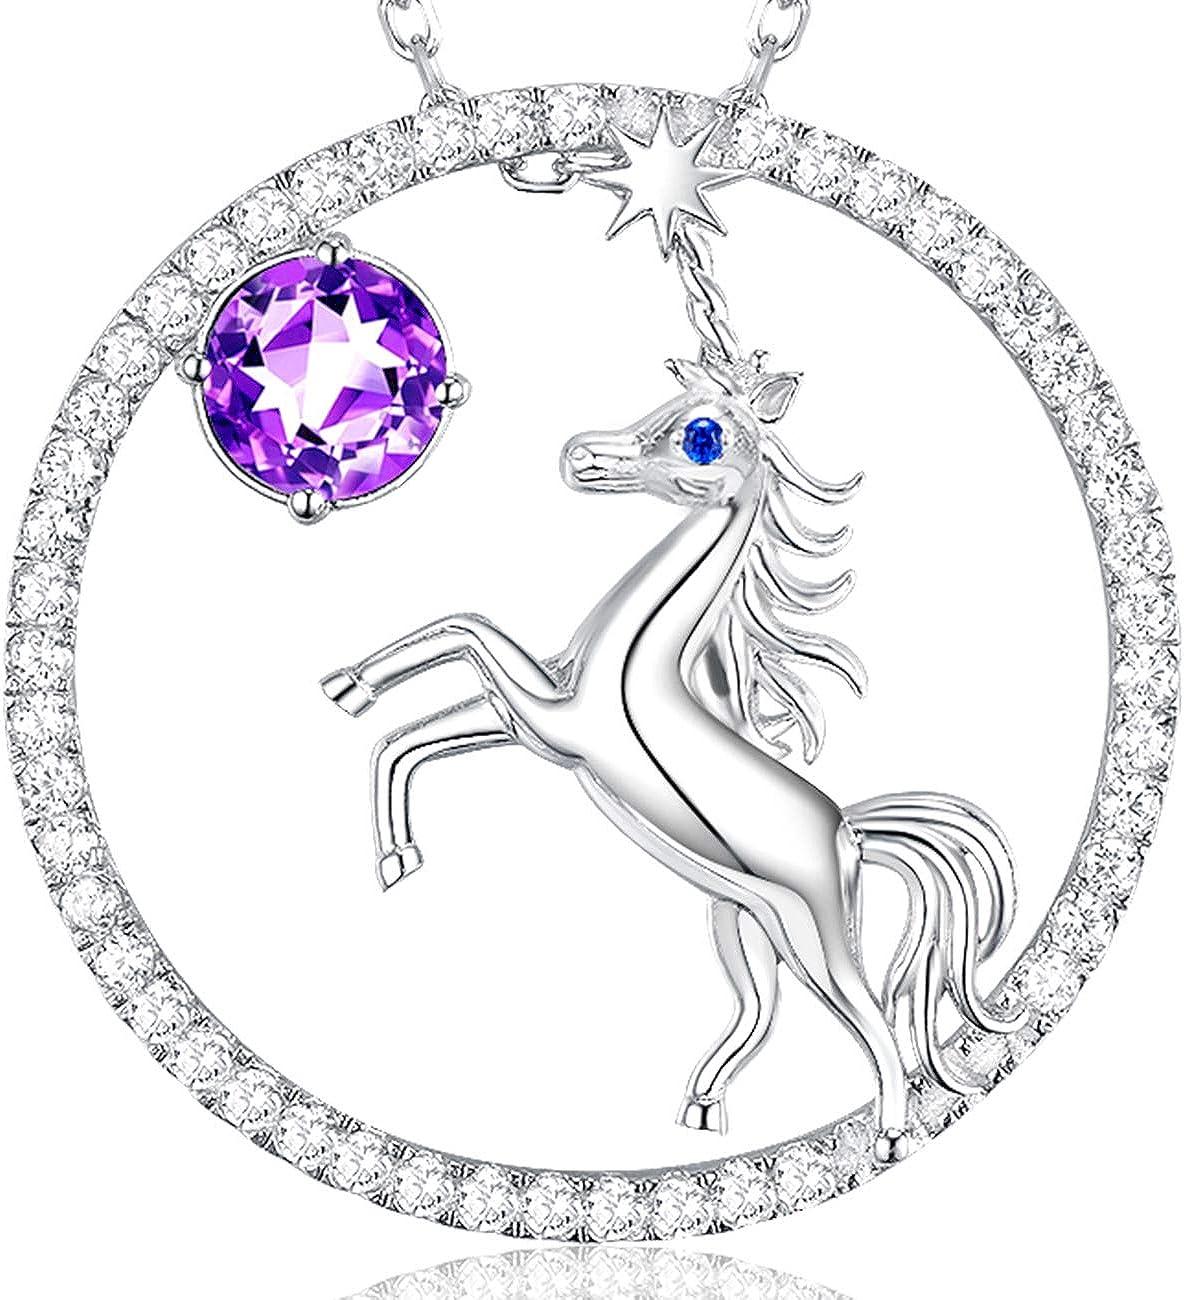 August September shipfree Birthstone Peridot Necklace Sapphire Blue Birth Cheap